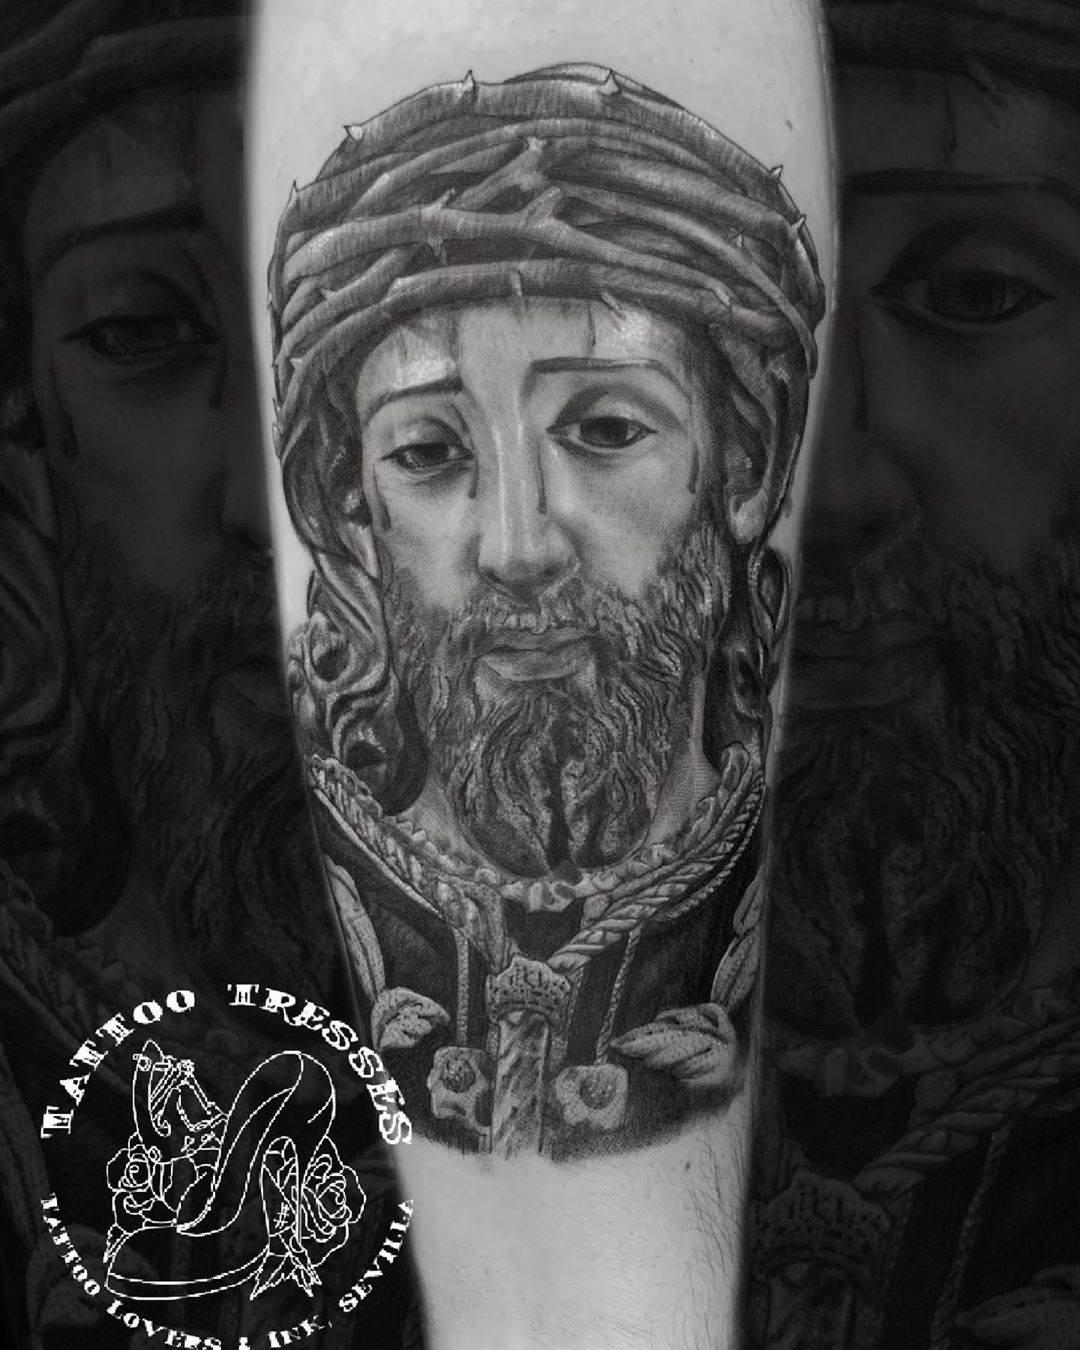 Sentencia Macarena para nuestro gran @gabiyuli17  Realizado por @tattoo_tresses  Con materiales de  @supplies_sevilla  @truegenttattoosupplies  @sumuntattoo  @stencilanchored  @tattoodefender  @believatattoospain  #fullcolor #tattooblackandgrey #tattooing #moreink #besttattoo #sentenciamacarena #esperanzamacarena #realismotattoo #tatuaje #tattooed #ink #tattoogirls #tatuaje #tattoo #tattoos  #inked #tattooink #inktattoo #senteciasevilla #girls #girlstattoo #moreink #tattooed #tattooedgirls #mont